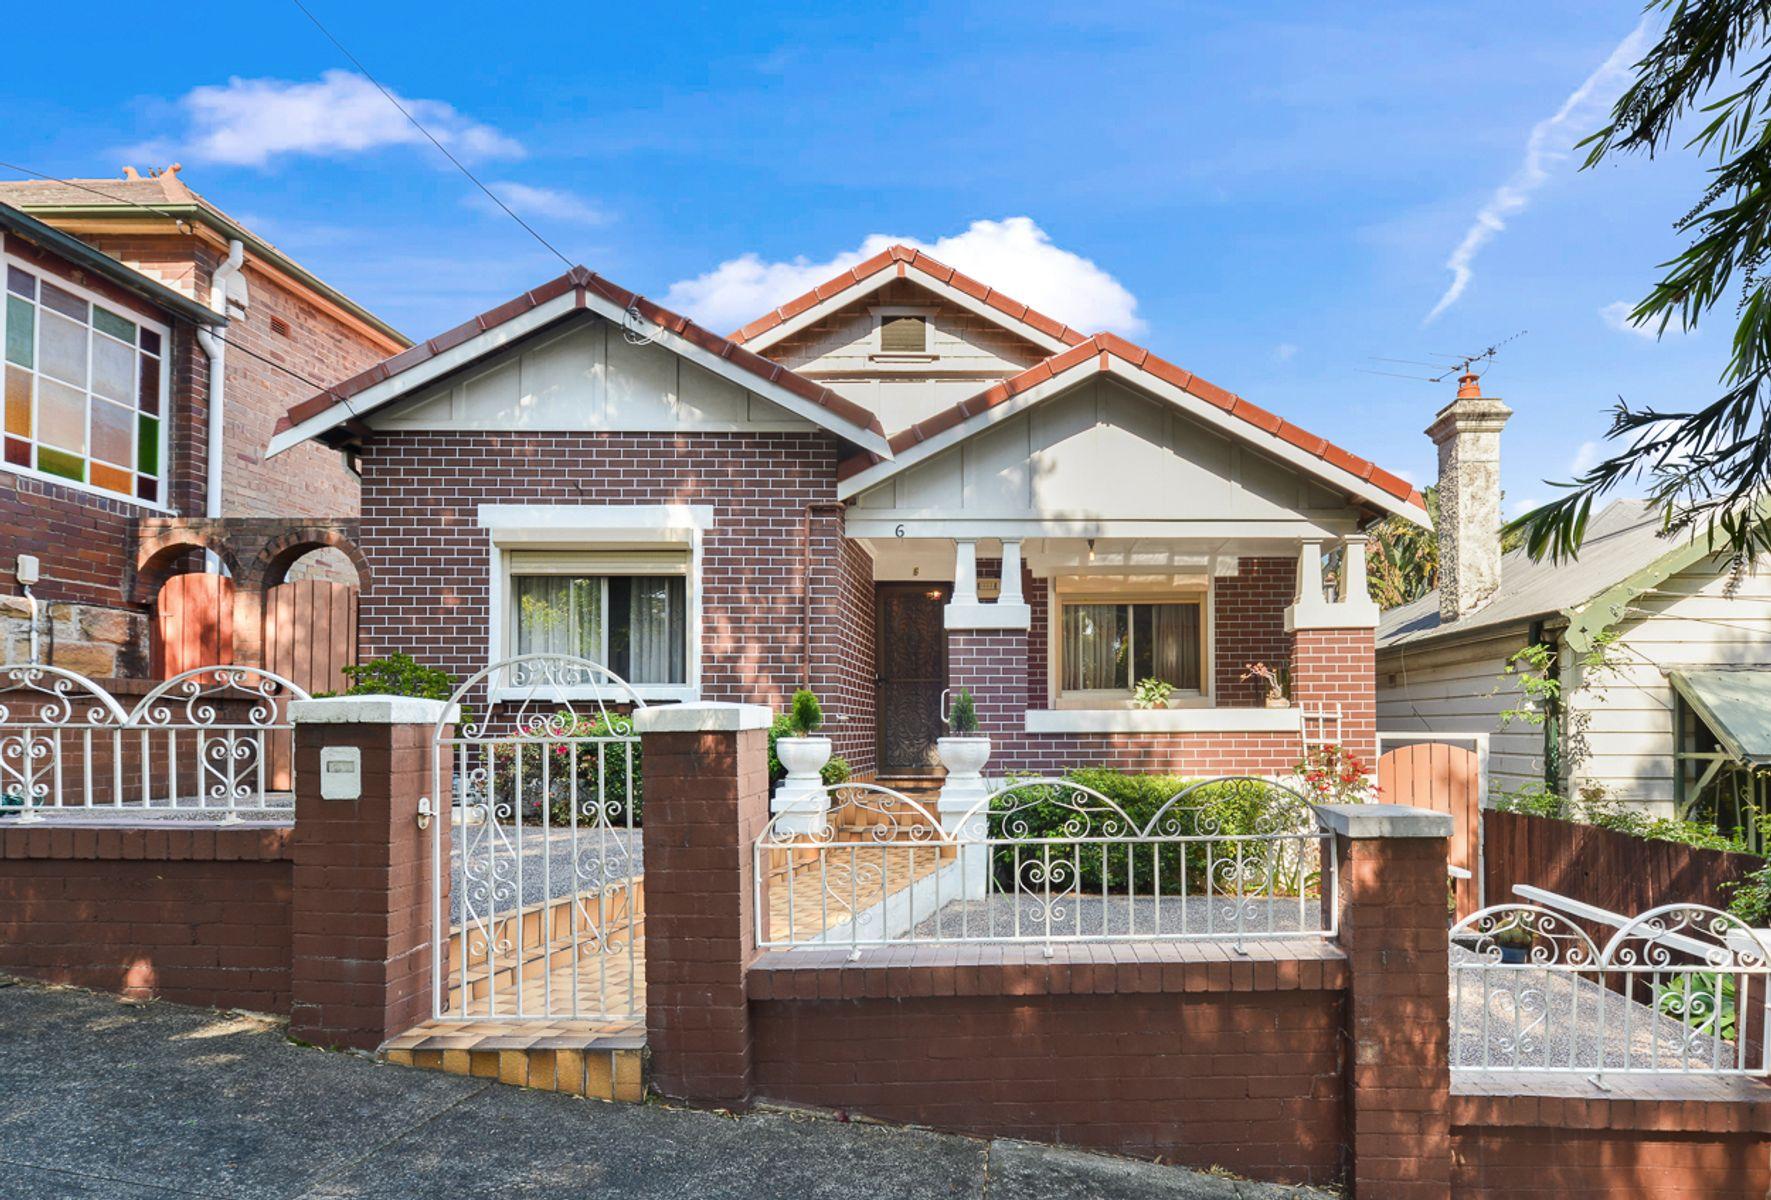 6 Day Street, Marrickville, NSW 2204